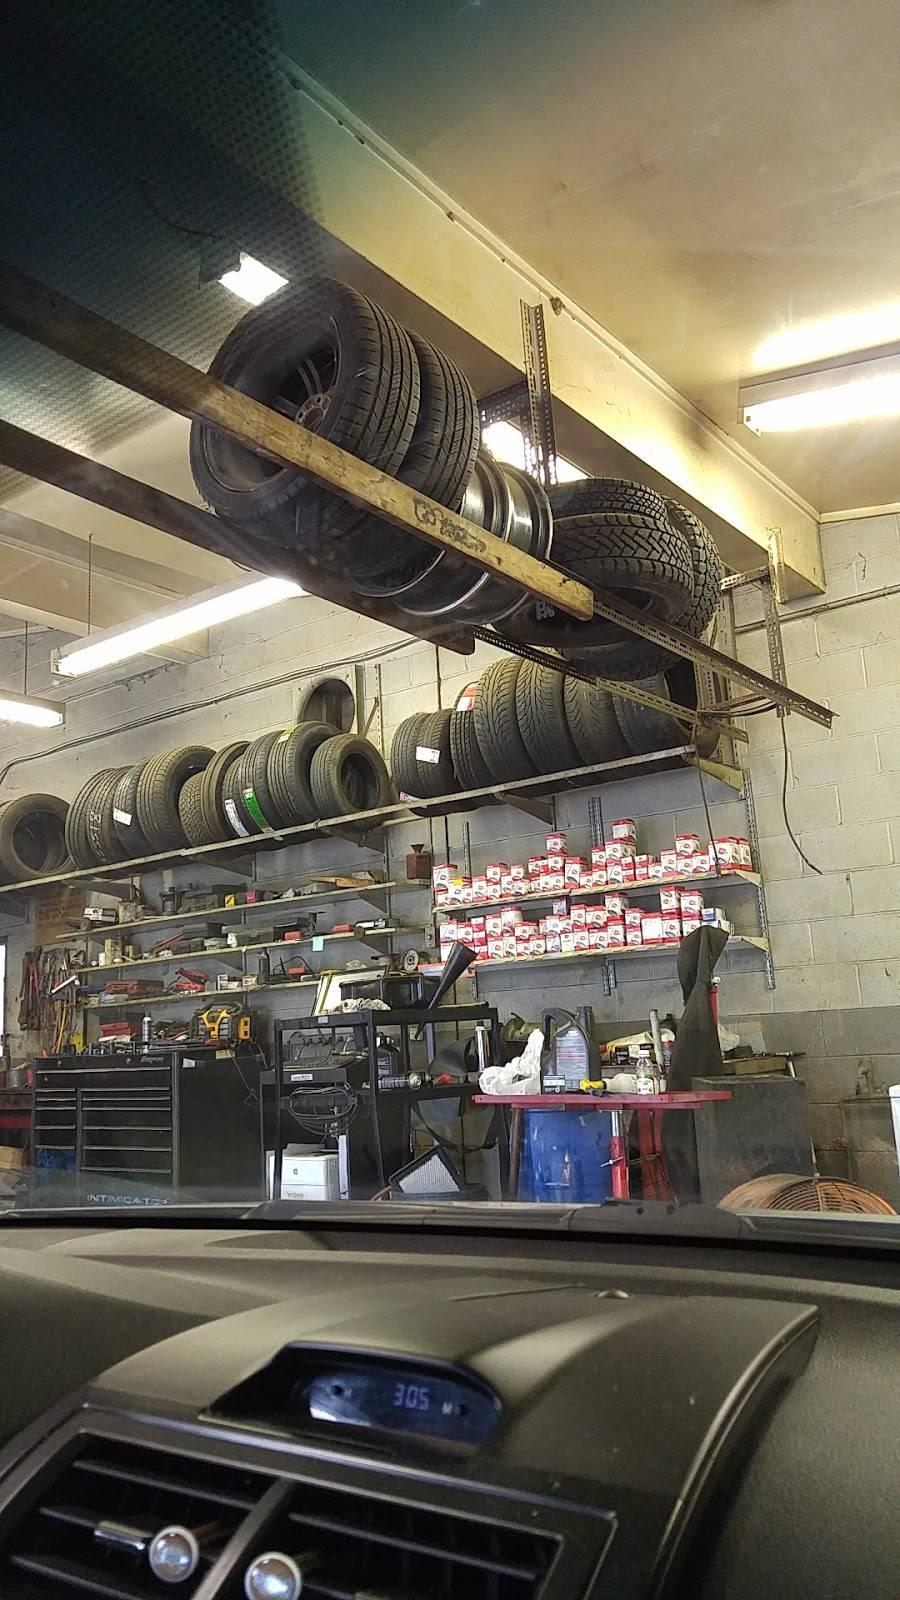 B & R Tire Services - car repair  | Photo 2 of 10 | Address: 4120 N Glenn Ave, Winston-Salem, NC 27105, USA | Phone: (336) 767-2910